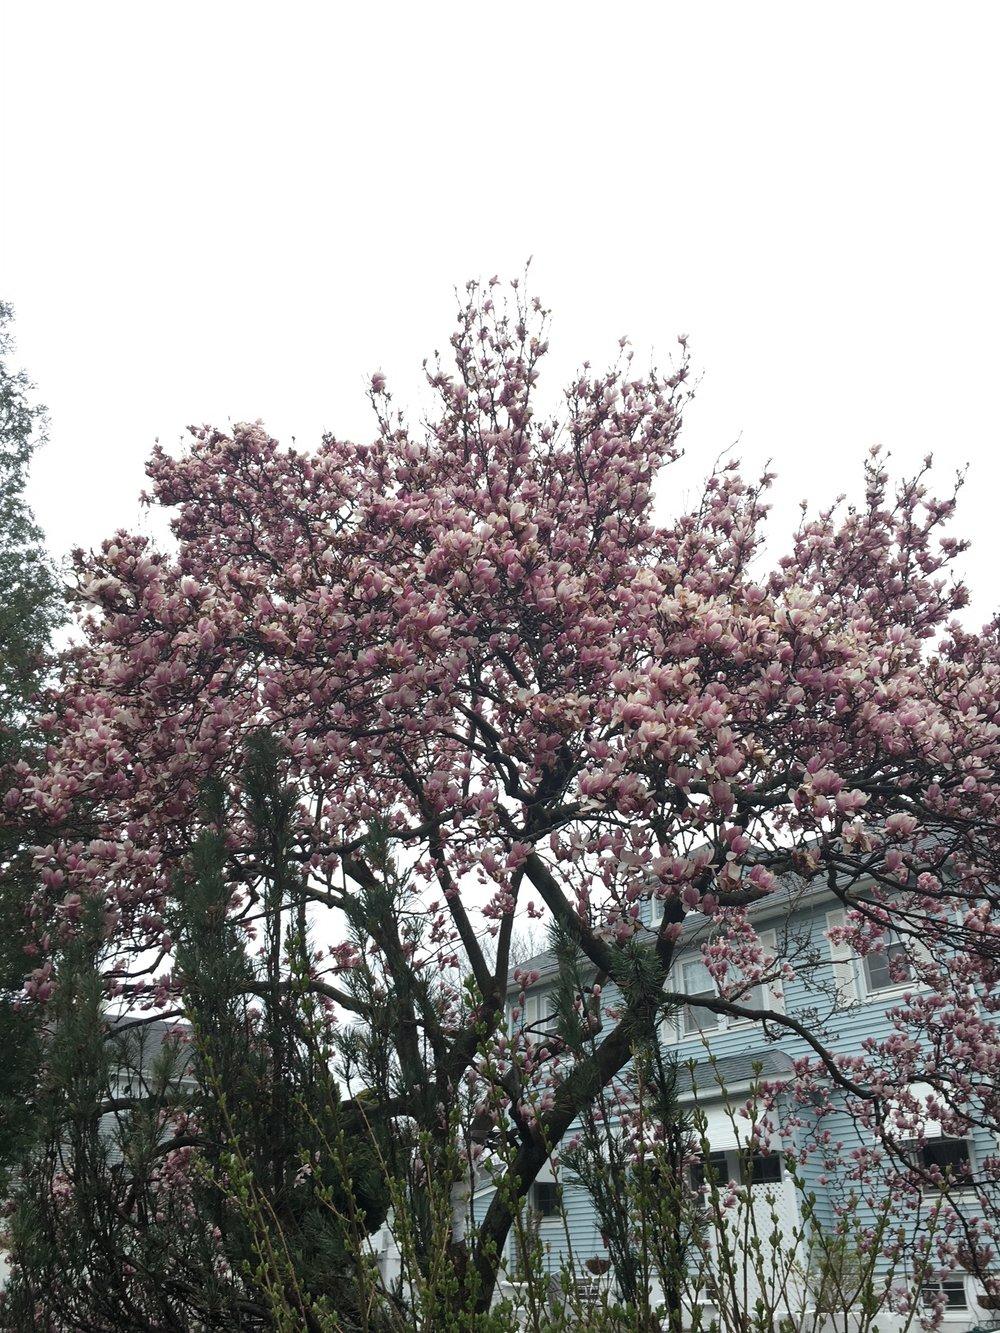 Same tree...